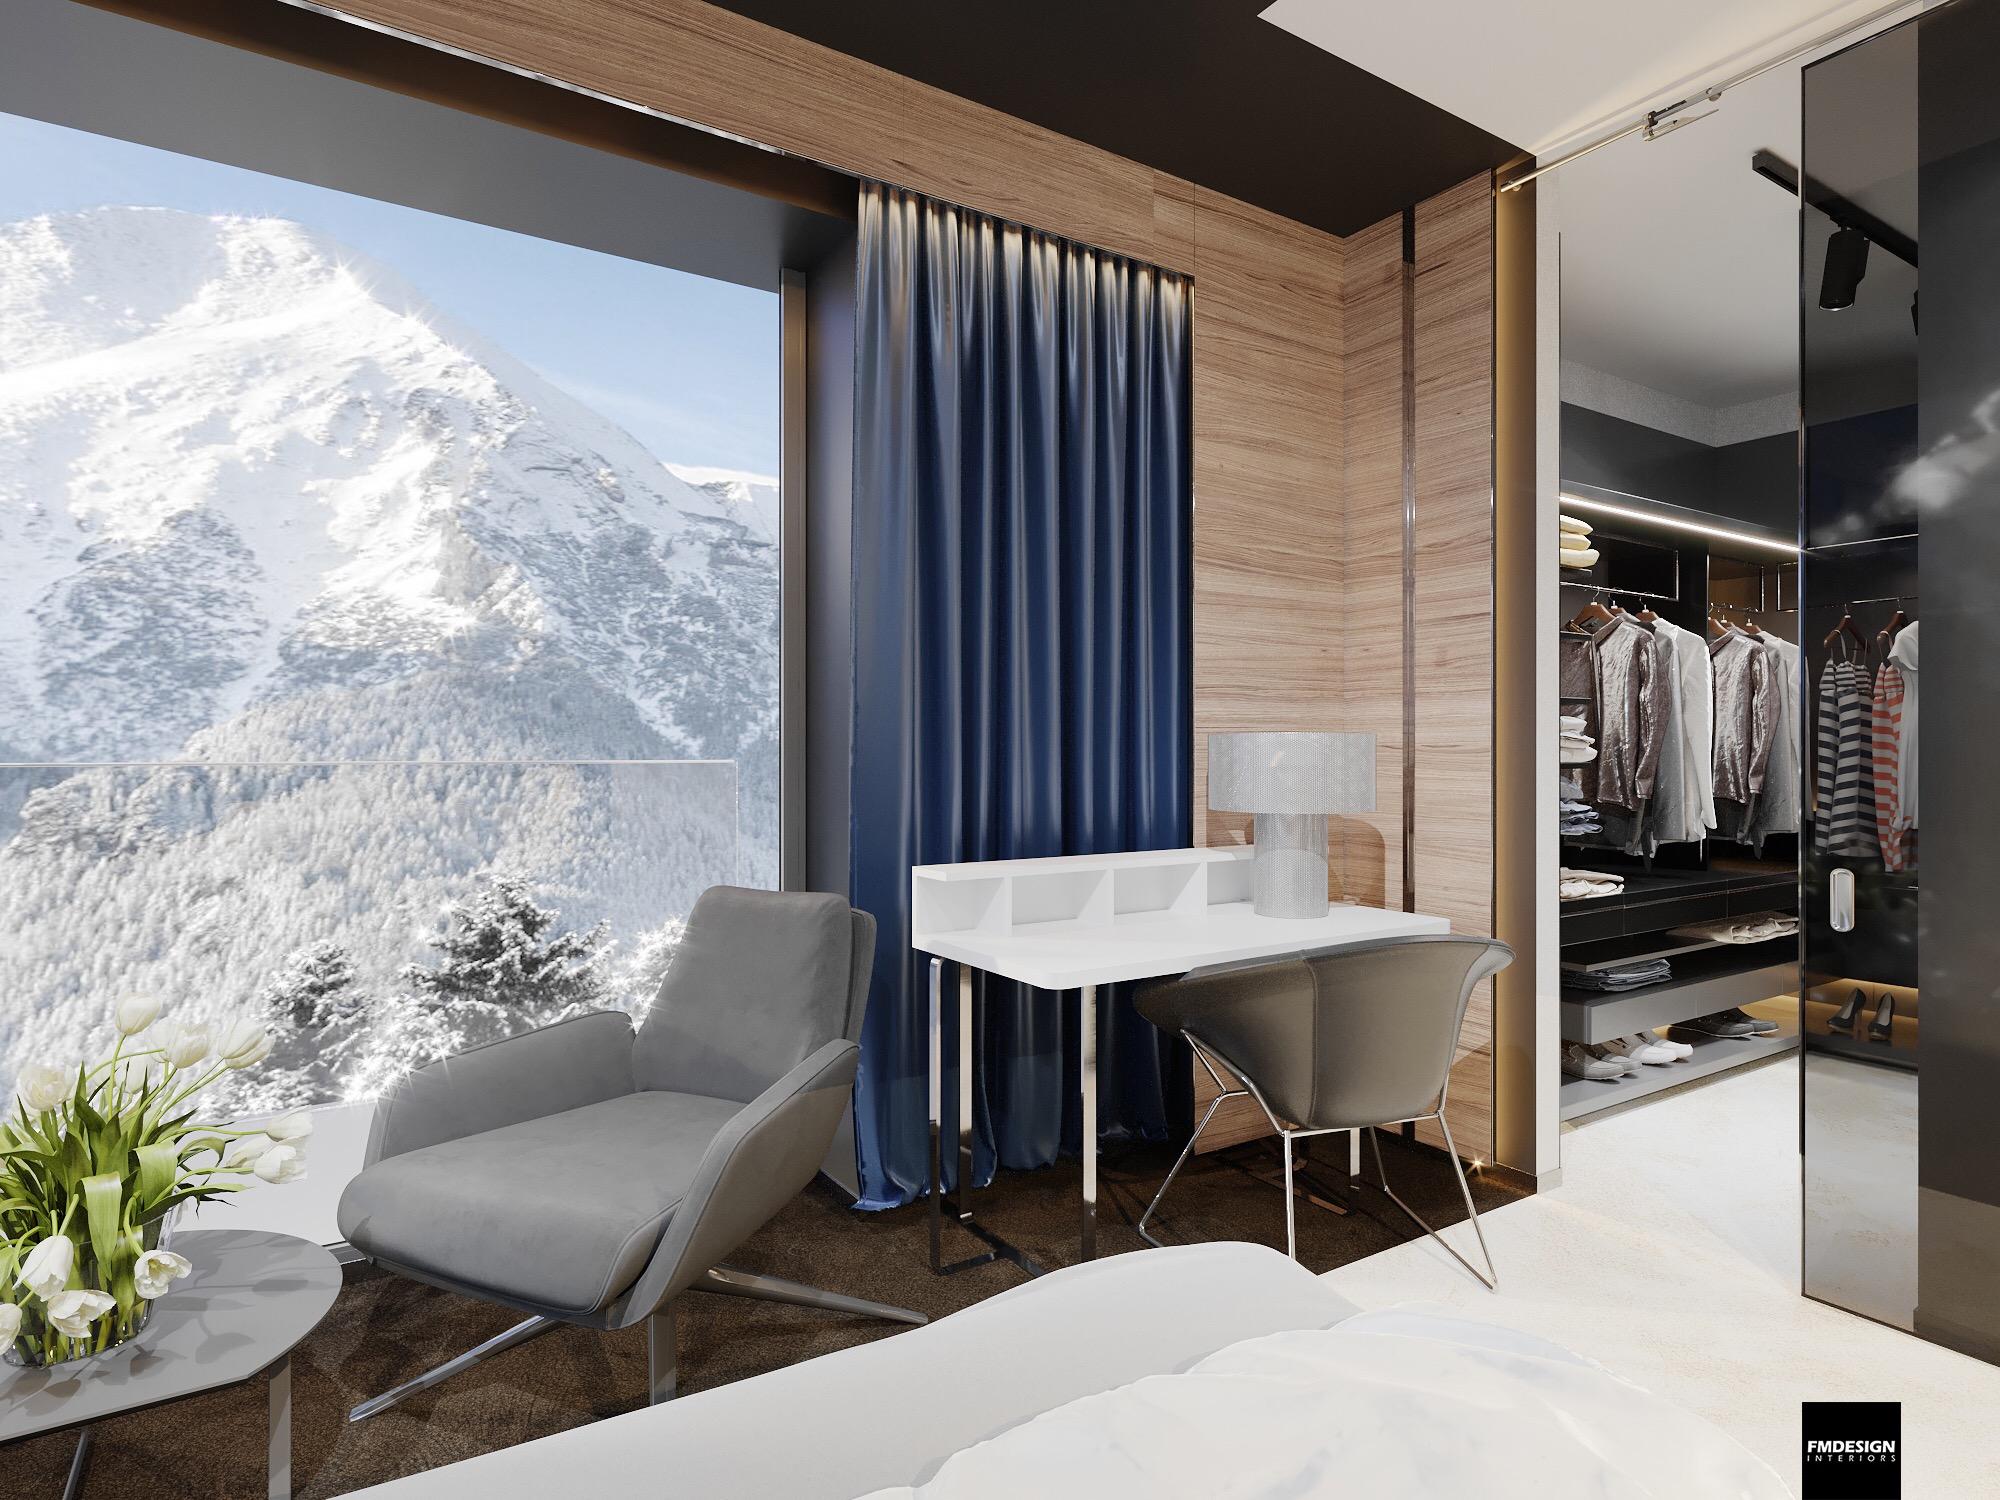 dizajn apartmanu hotelovy nabytok (7)